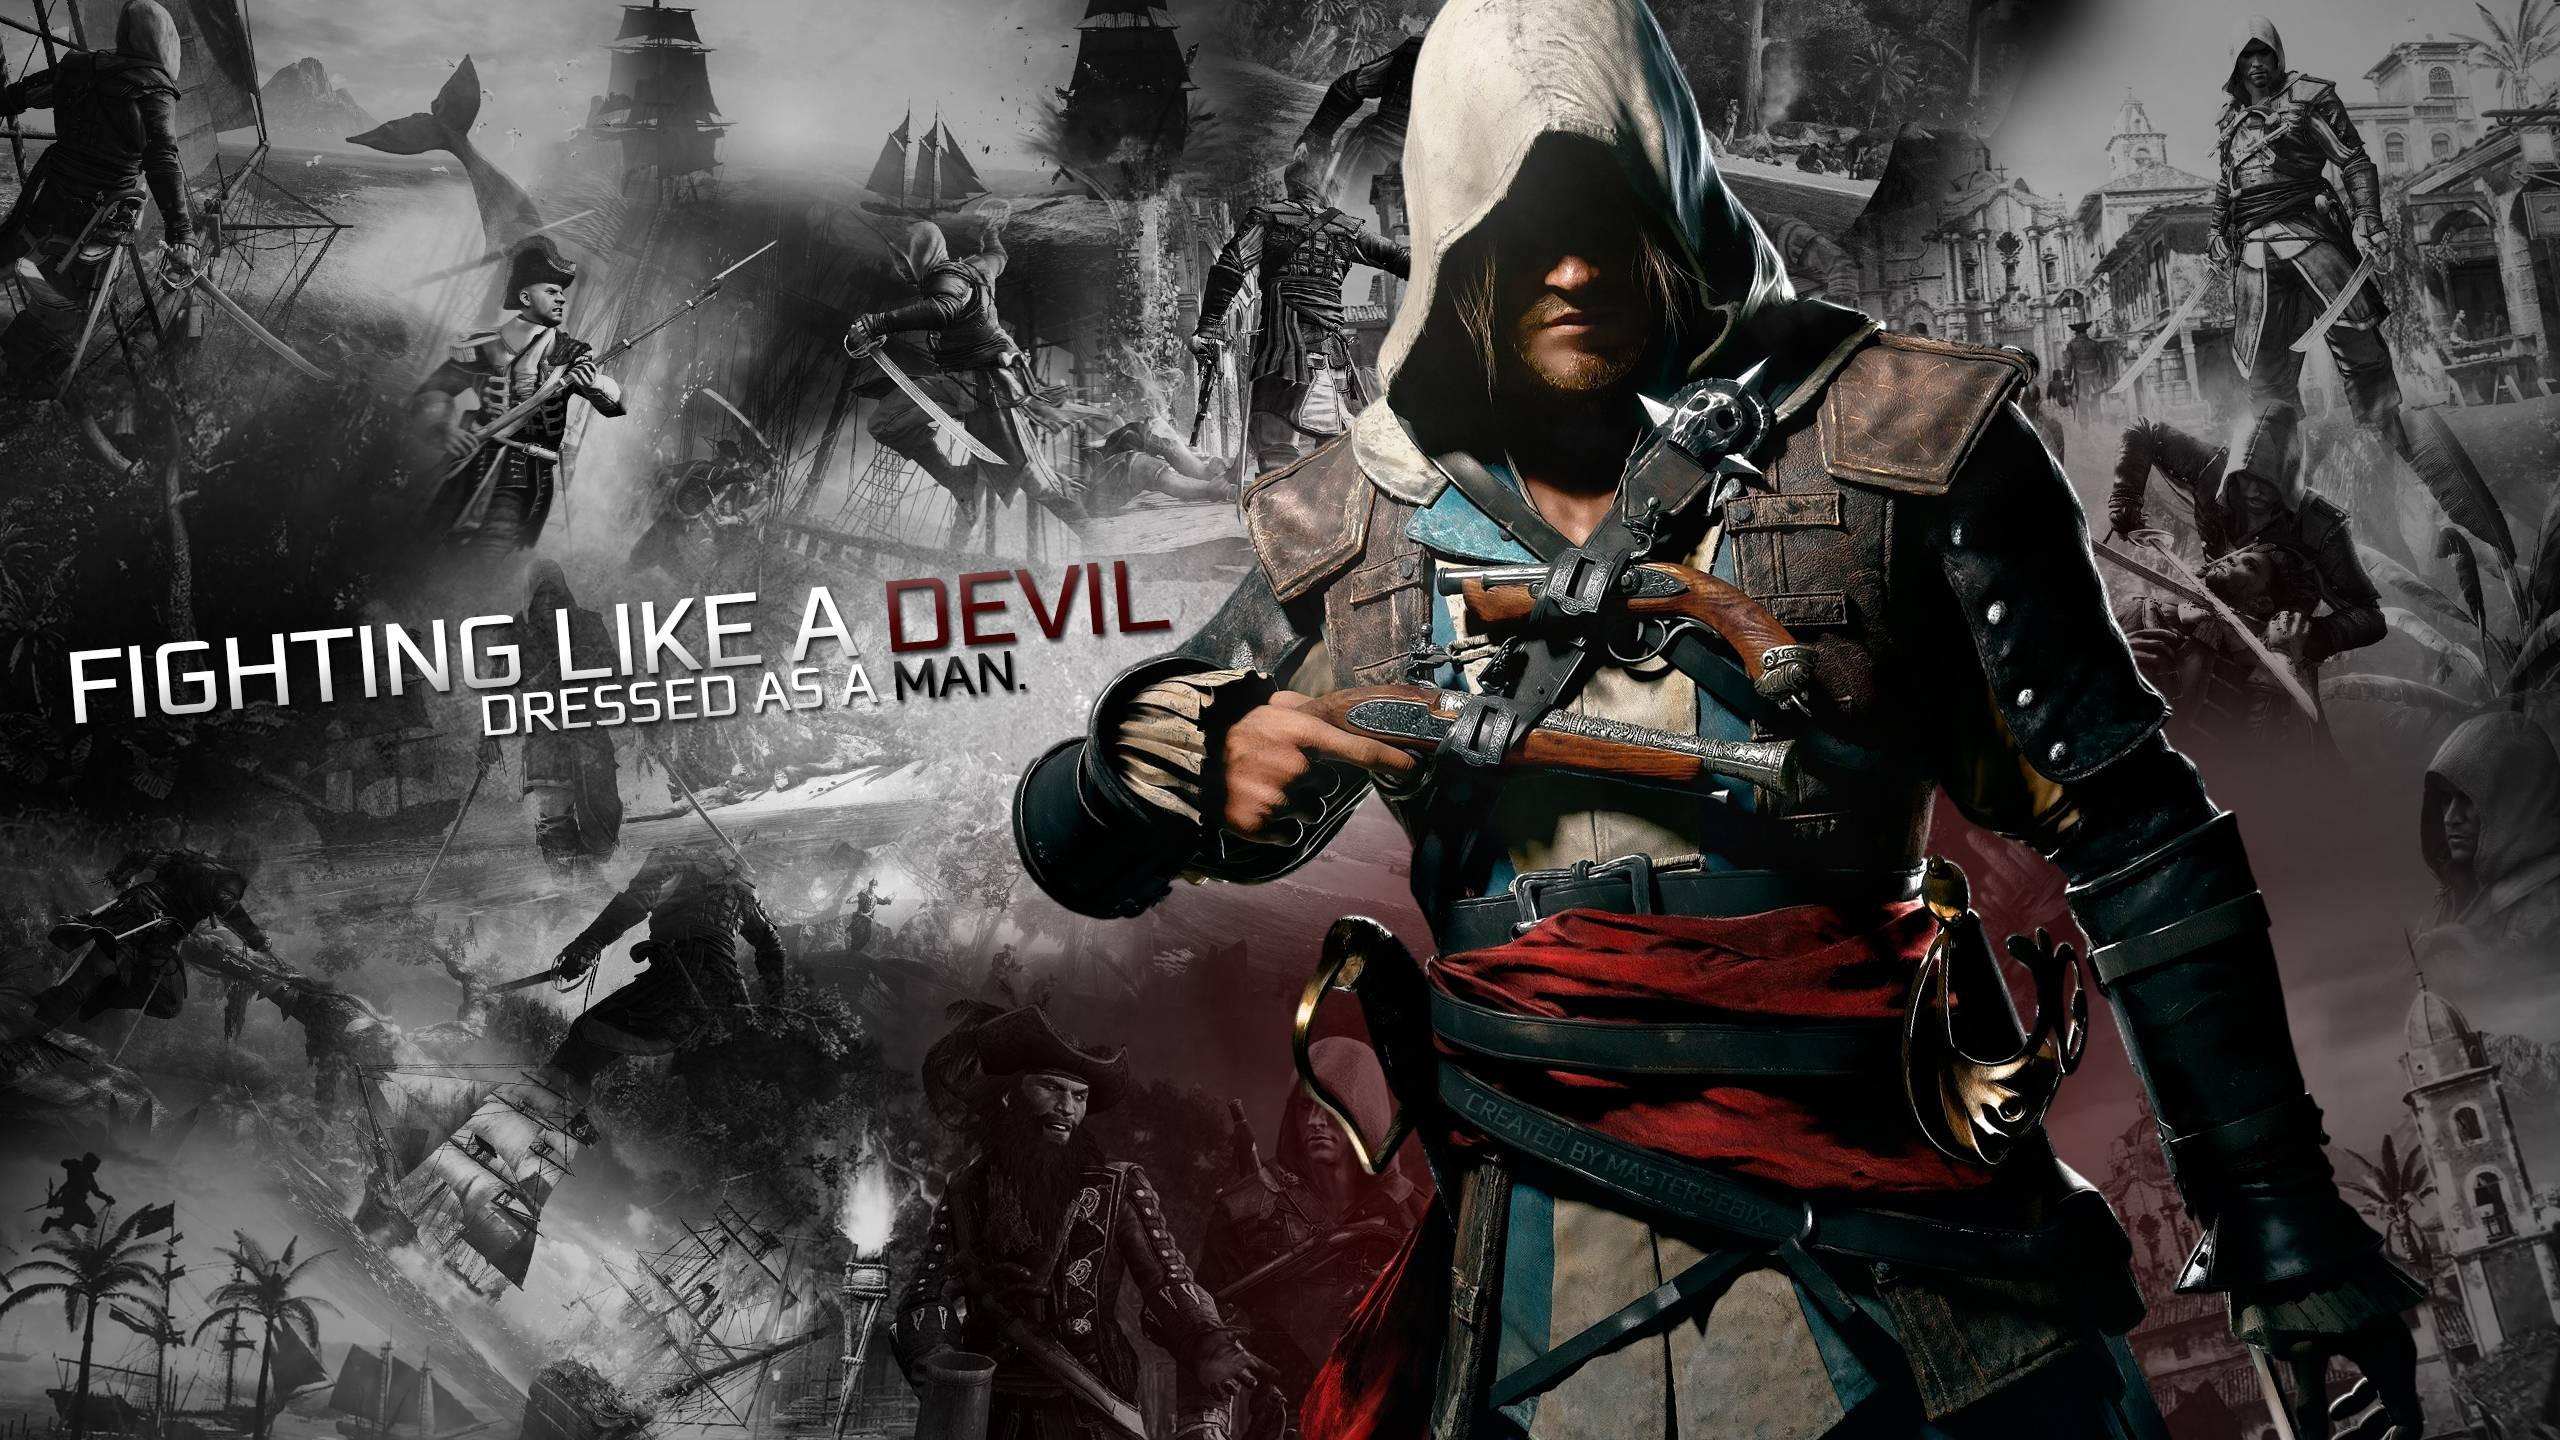 assassins creed 5 wallpaper - photo #11